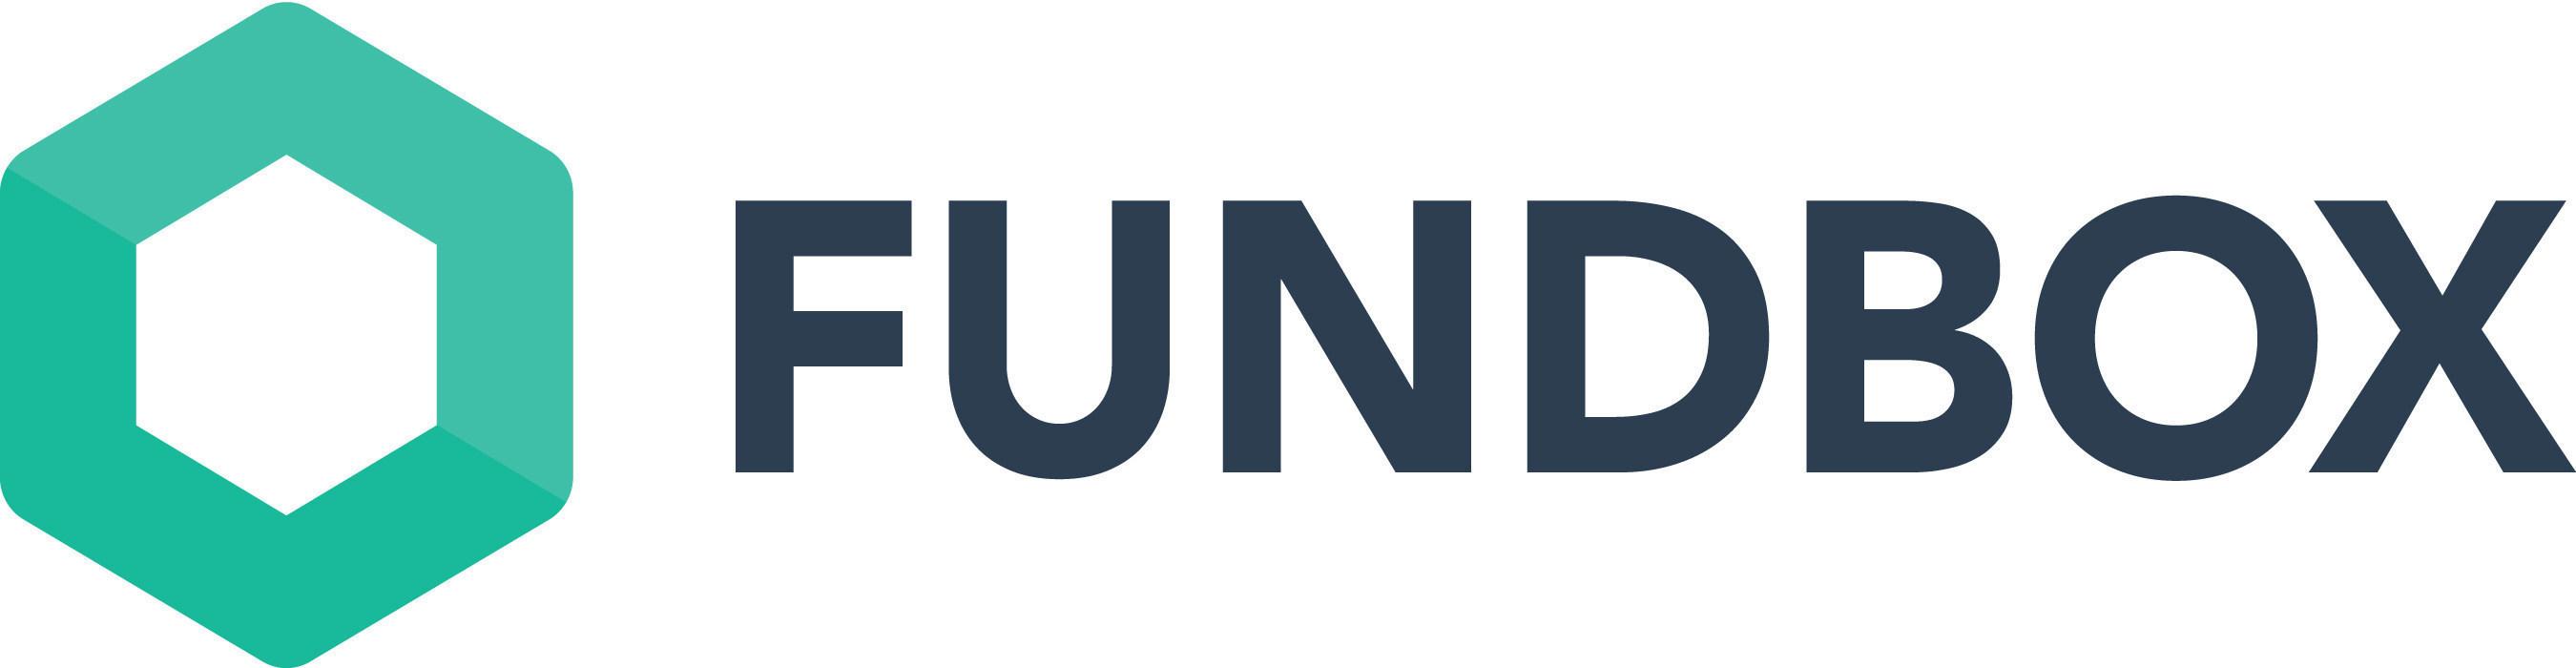 Fundbox announces new round of funding